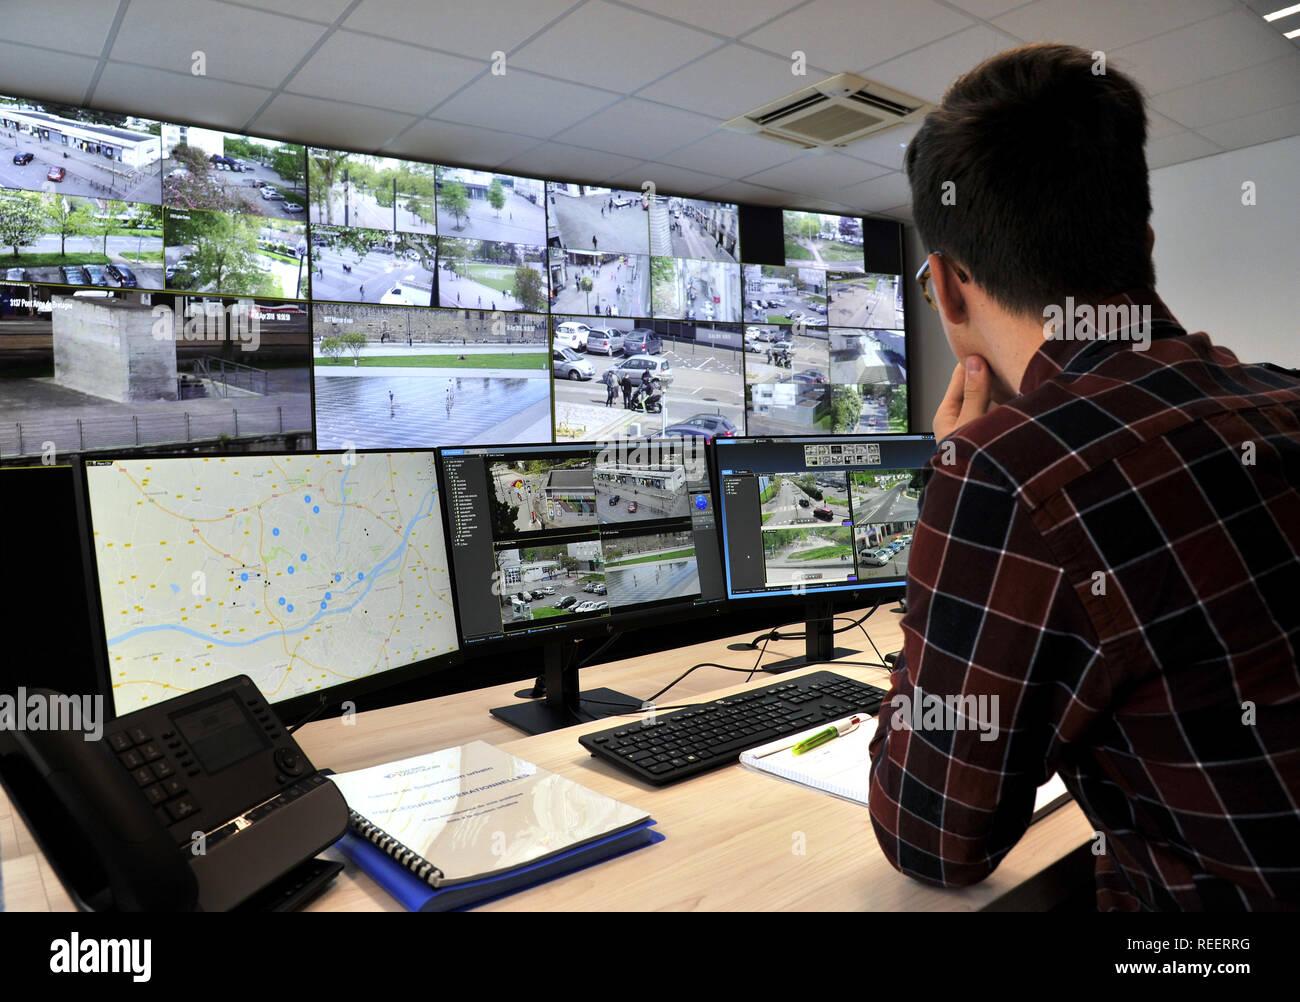 Nantes (north-western France), on 2018/04/26: Urban surveillance center ÒCentre de Supervision Urbain metropolitain pour la videoprotectionÓ. Operator - Stock Image